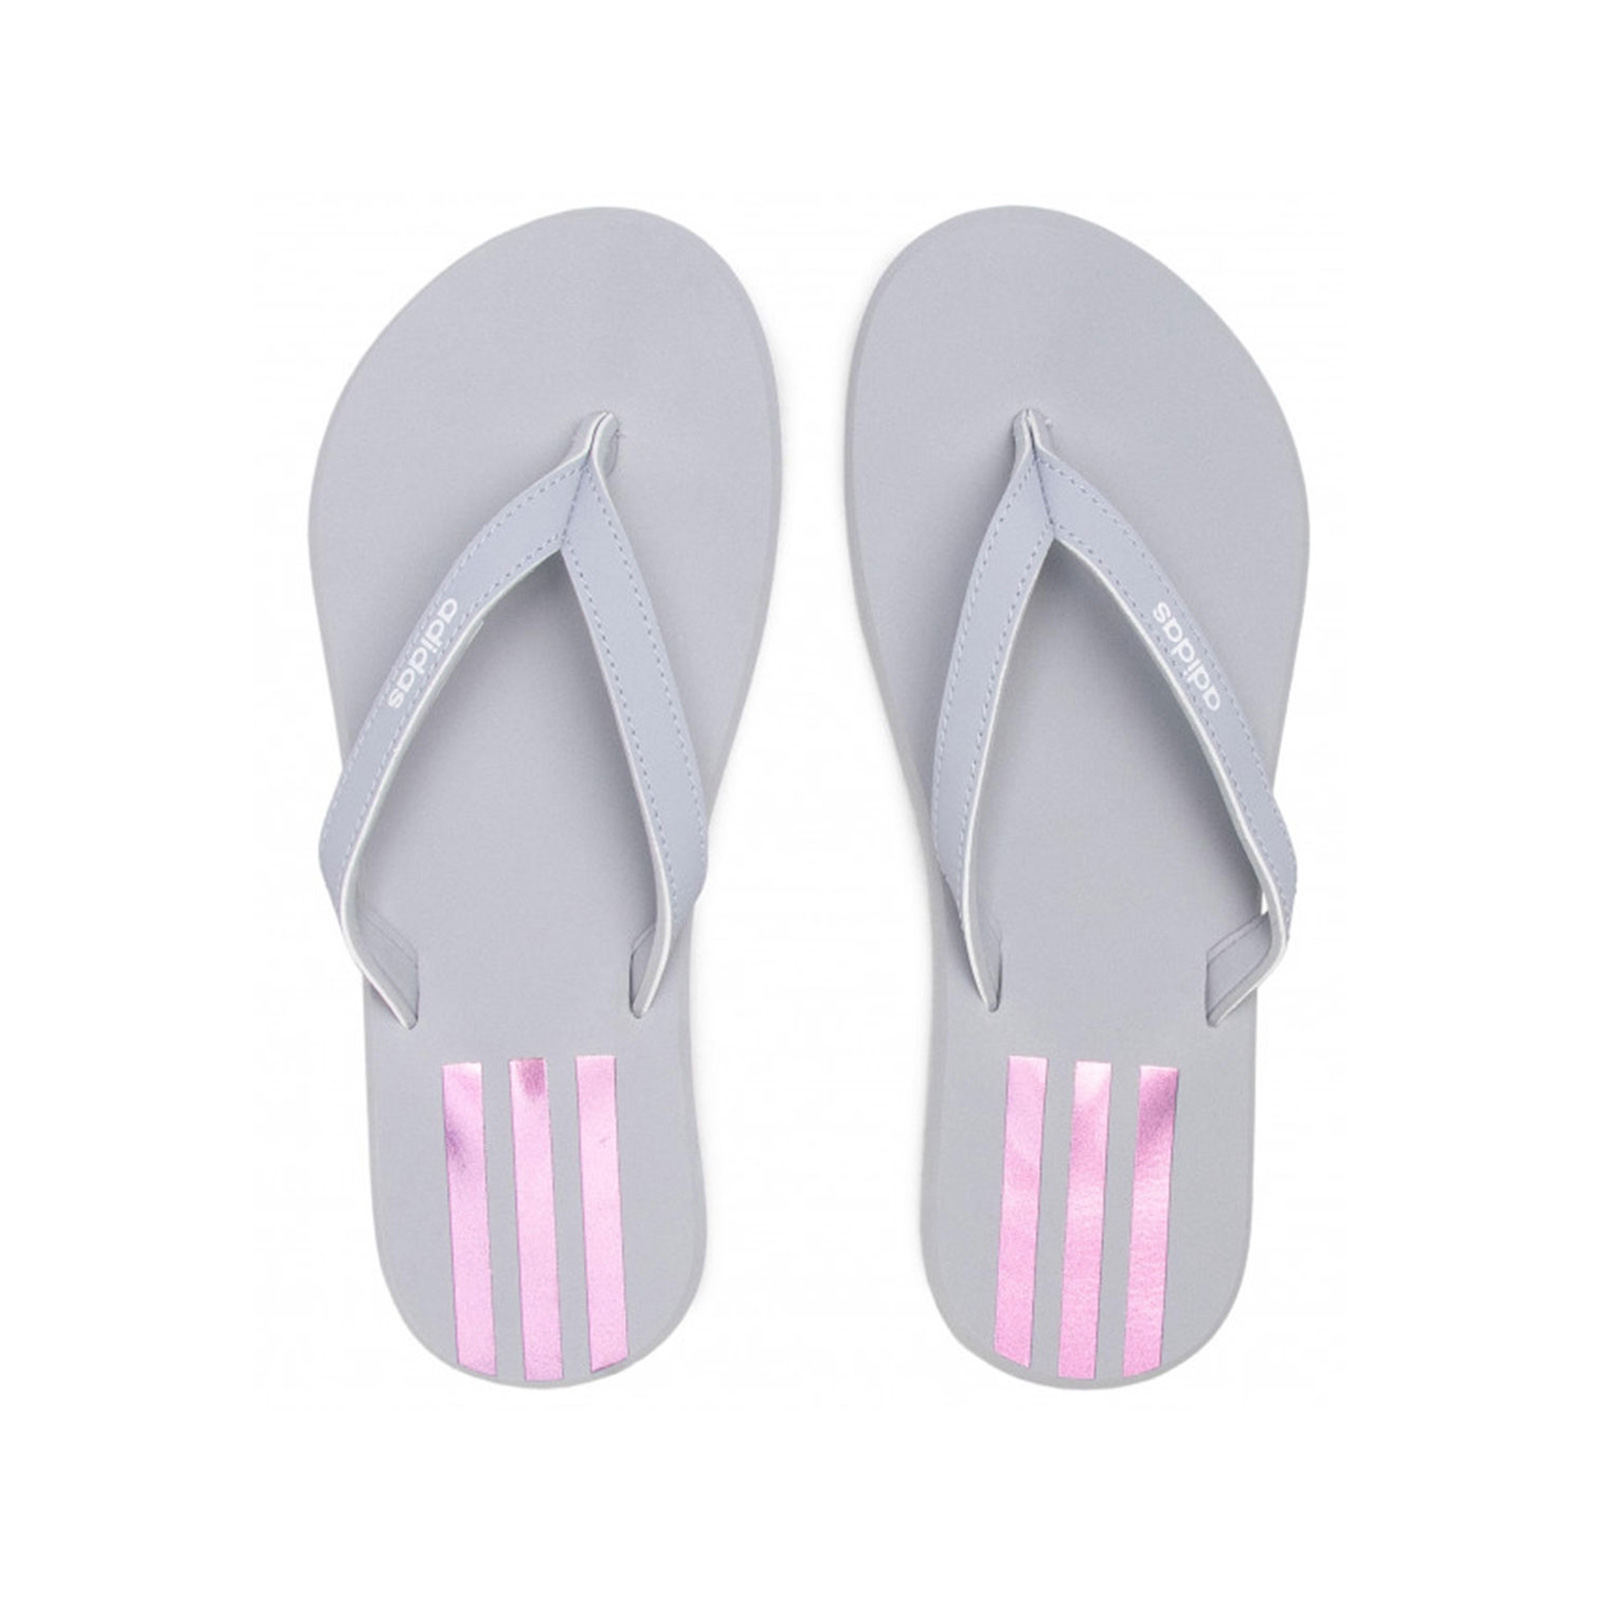 adidas - EEZAY FLIP FLOP - HALSIL/IRIDES/FTWWHT - adidas -